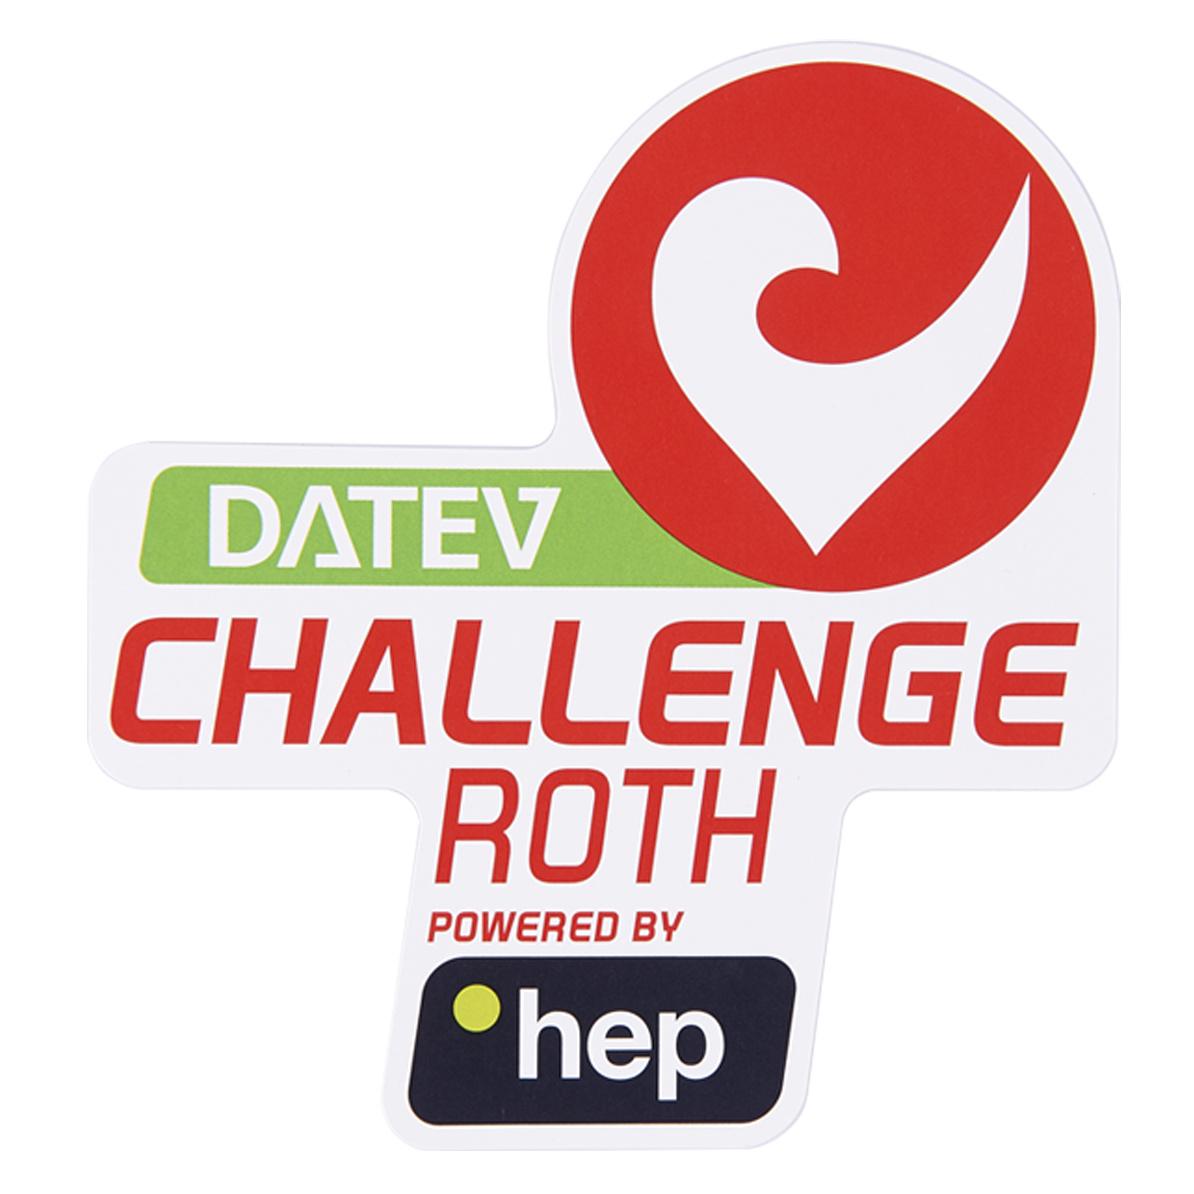 Sticker DATEV Challenge Roth powered by hep big-1